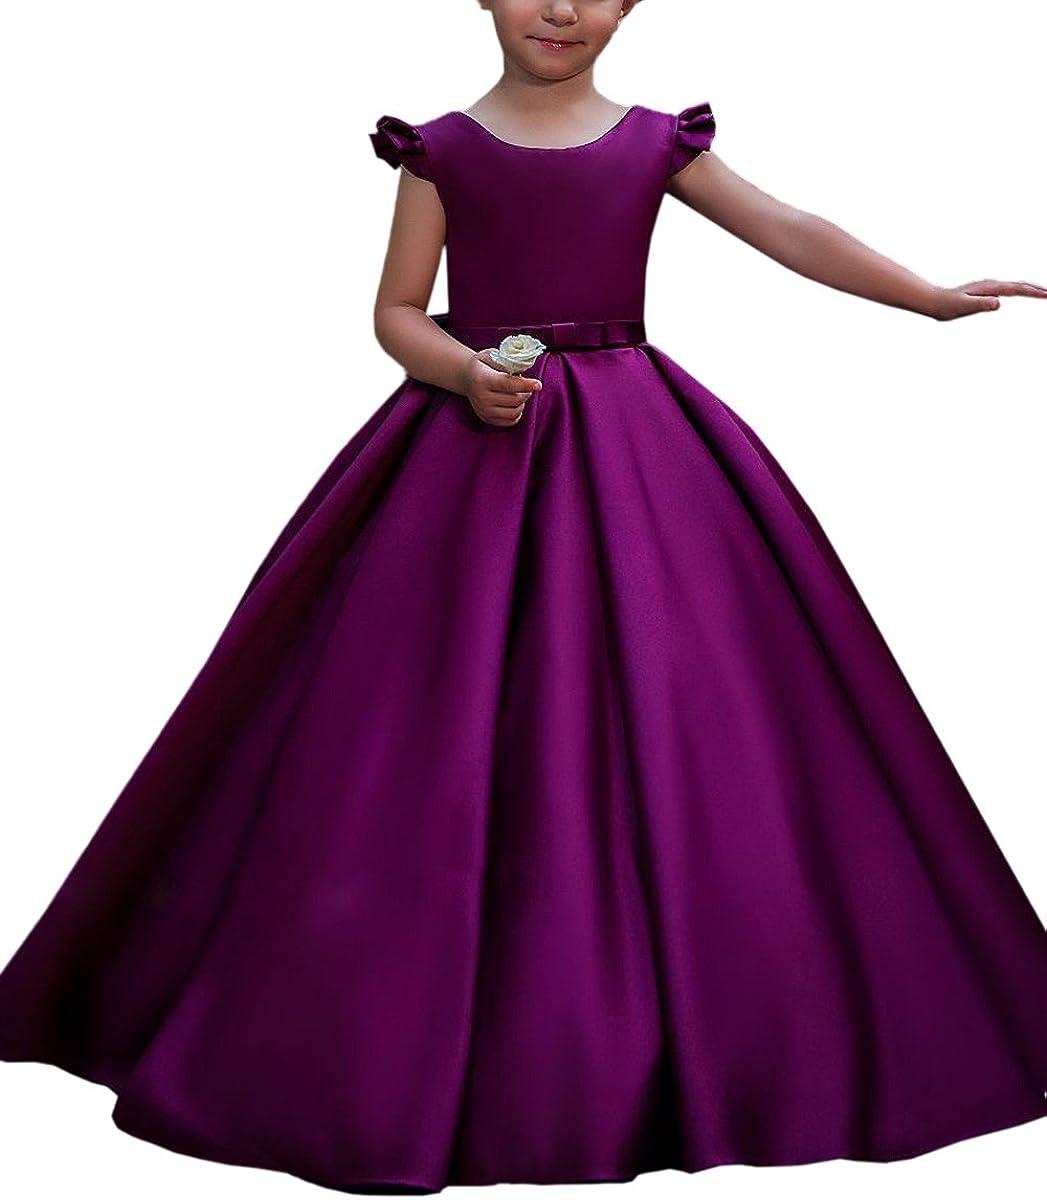 Amazon Com Satin Flower Girl Dress For Wedding Big Bow Kids Ball Gowns Purple Custom Size Clothing,Semi Formal Wedding Guest Dress Code